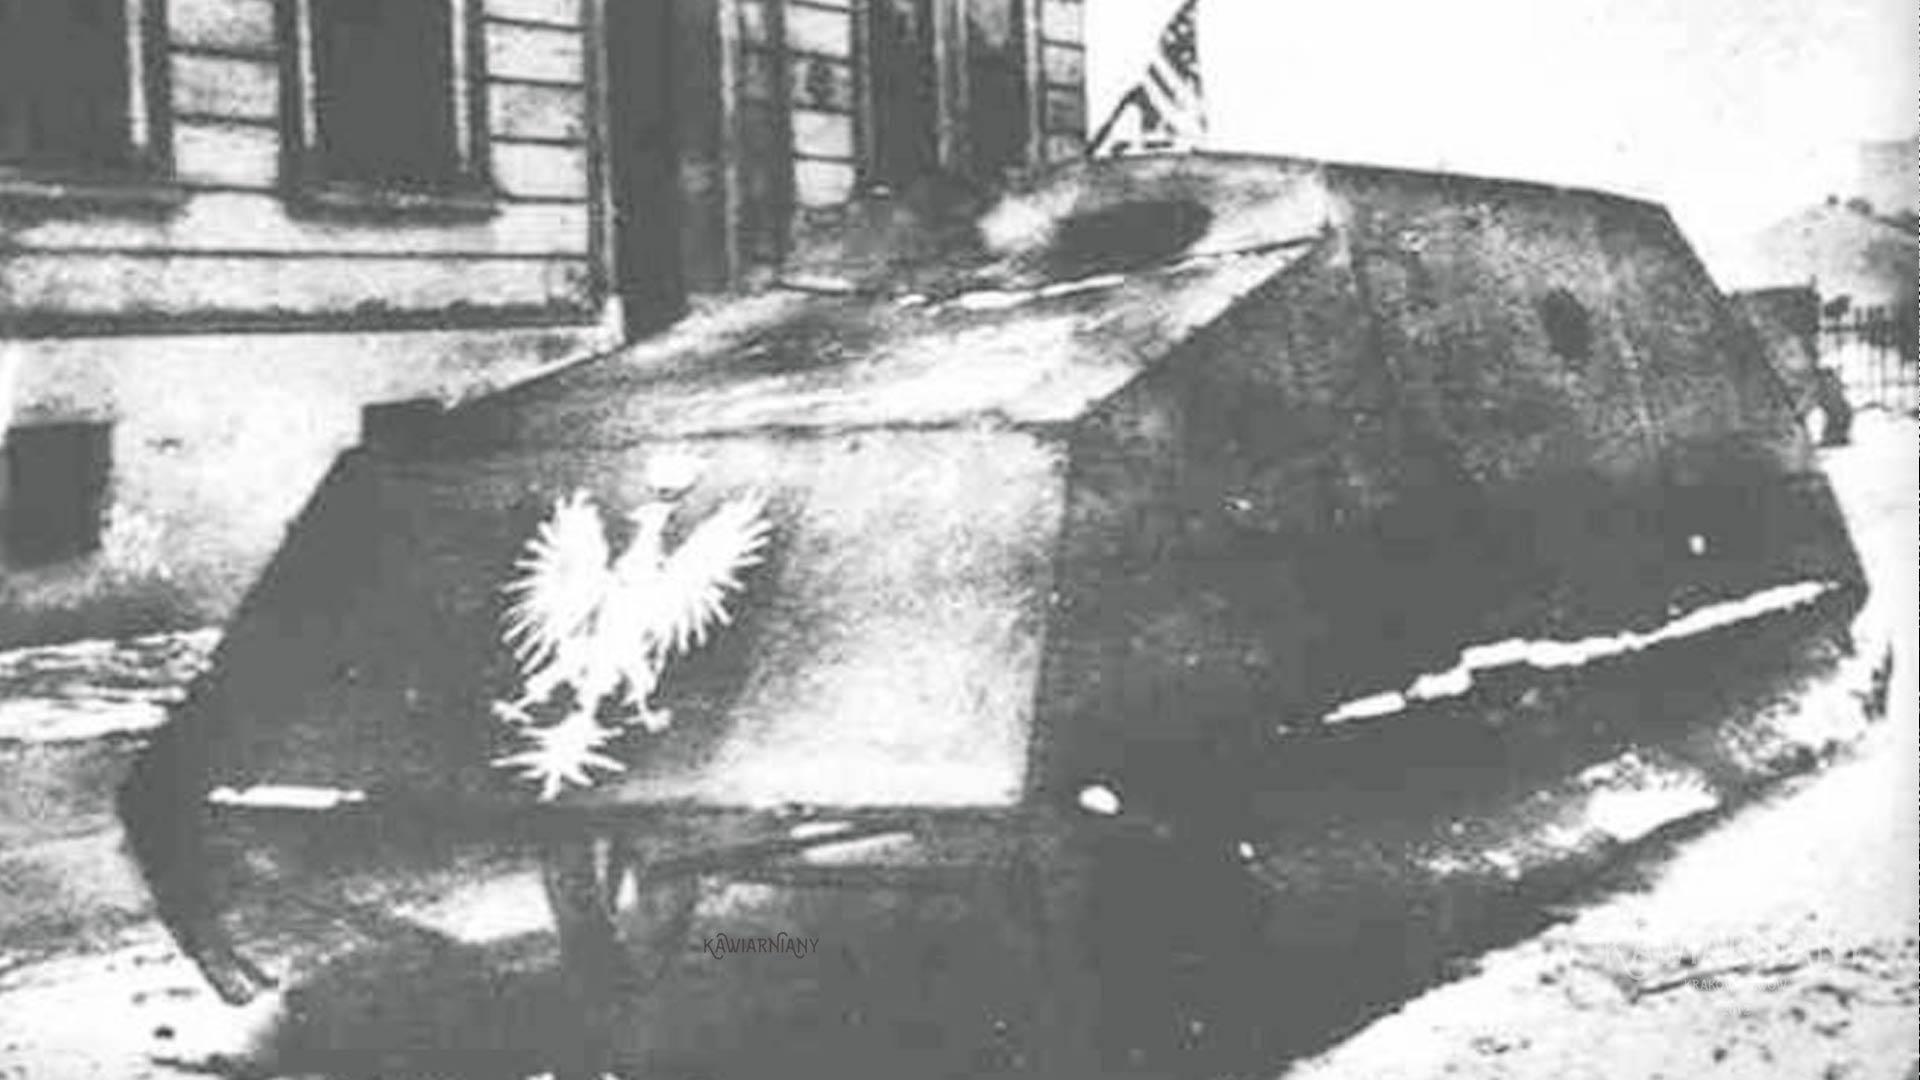 Pojazd pancerny Piłsudski